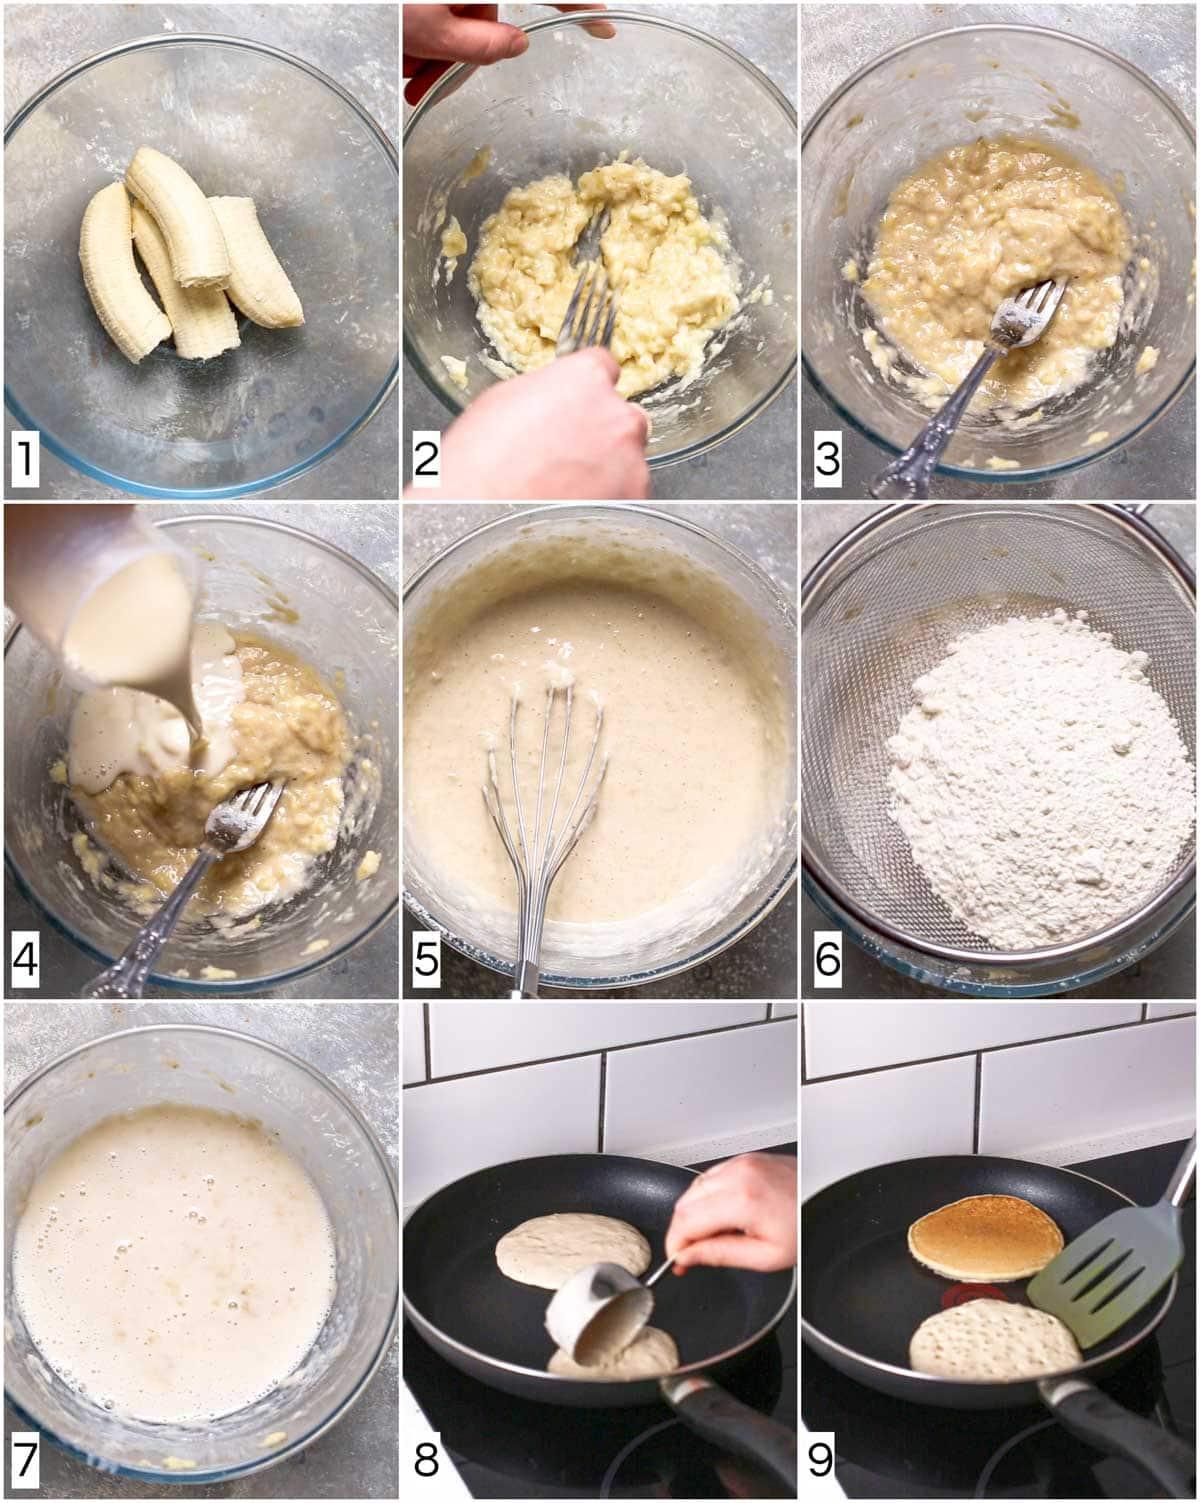 A collage of nine images showing nine steps in making vegan pancakes.